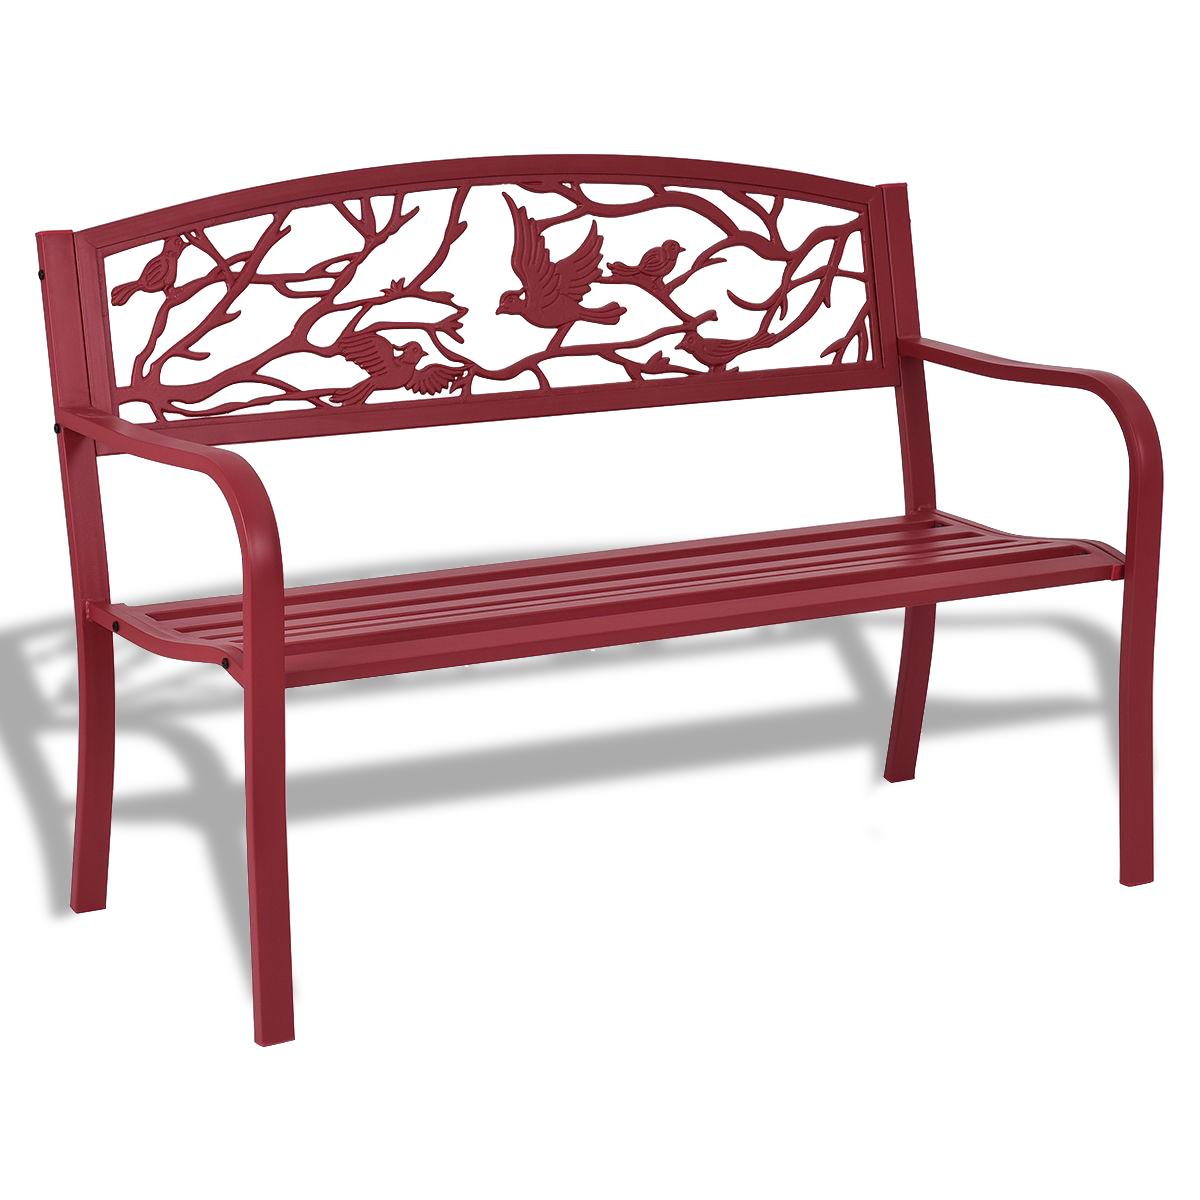 Patio Garden Bench Park Yard Outdoor Furniture